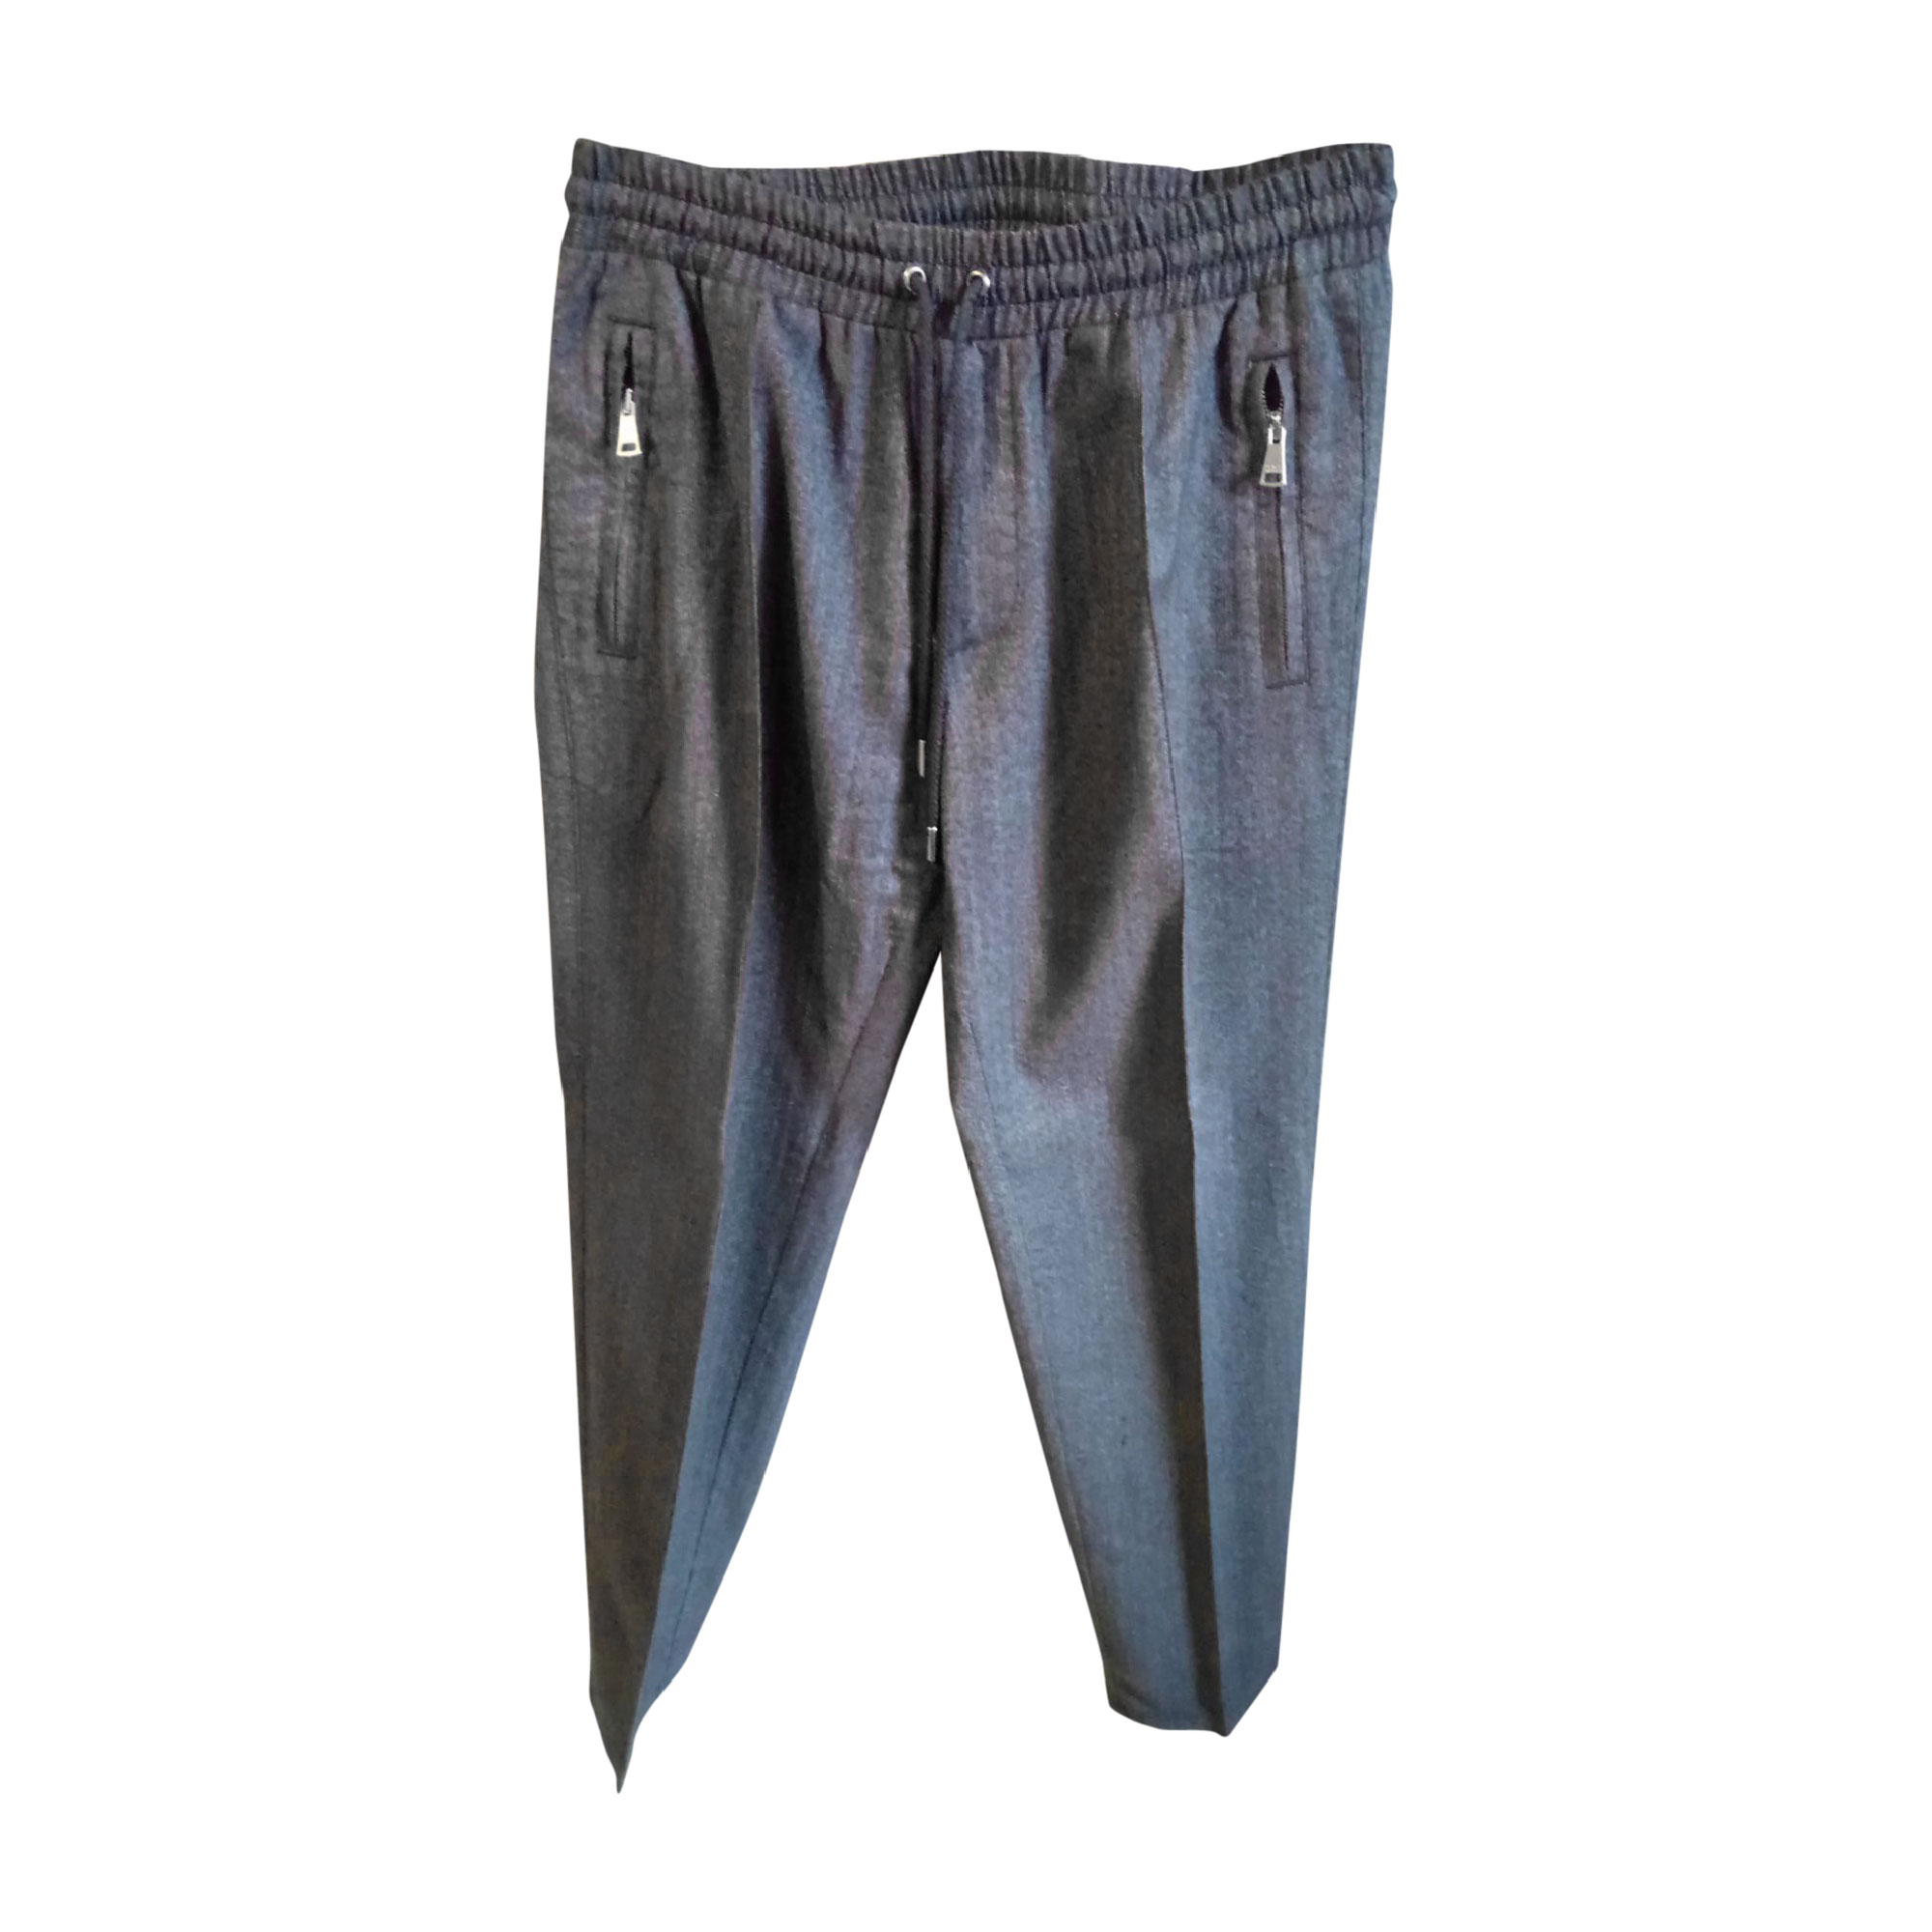 Pantalon large DOLCE & GABBANA Gris, anthracite